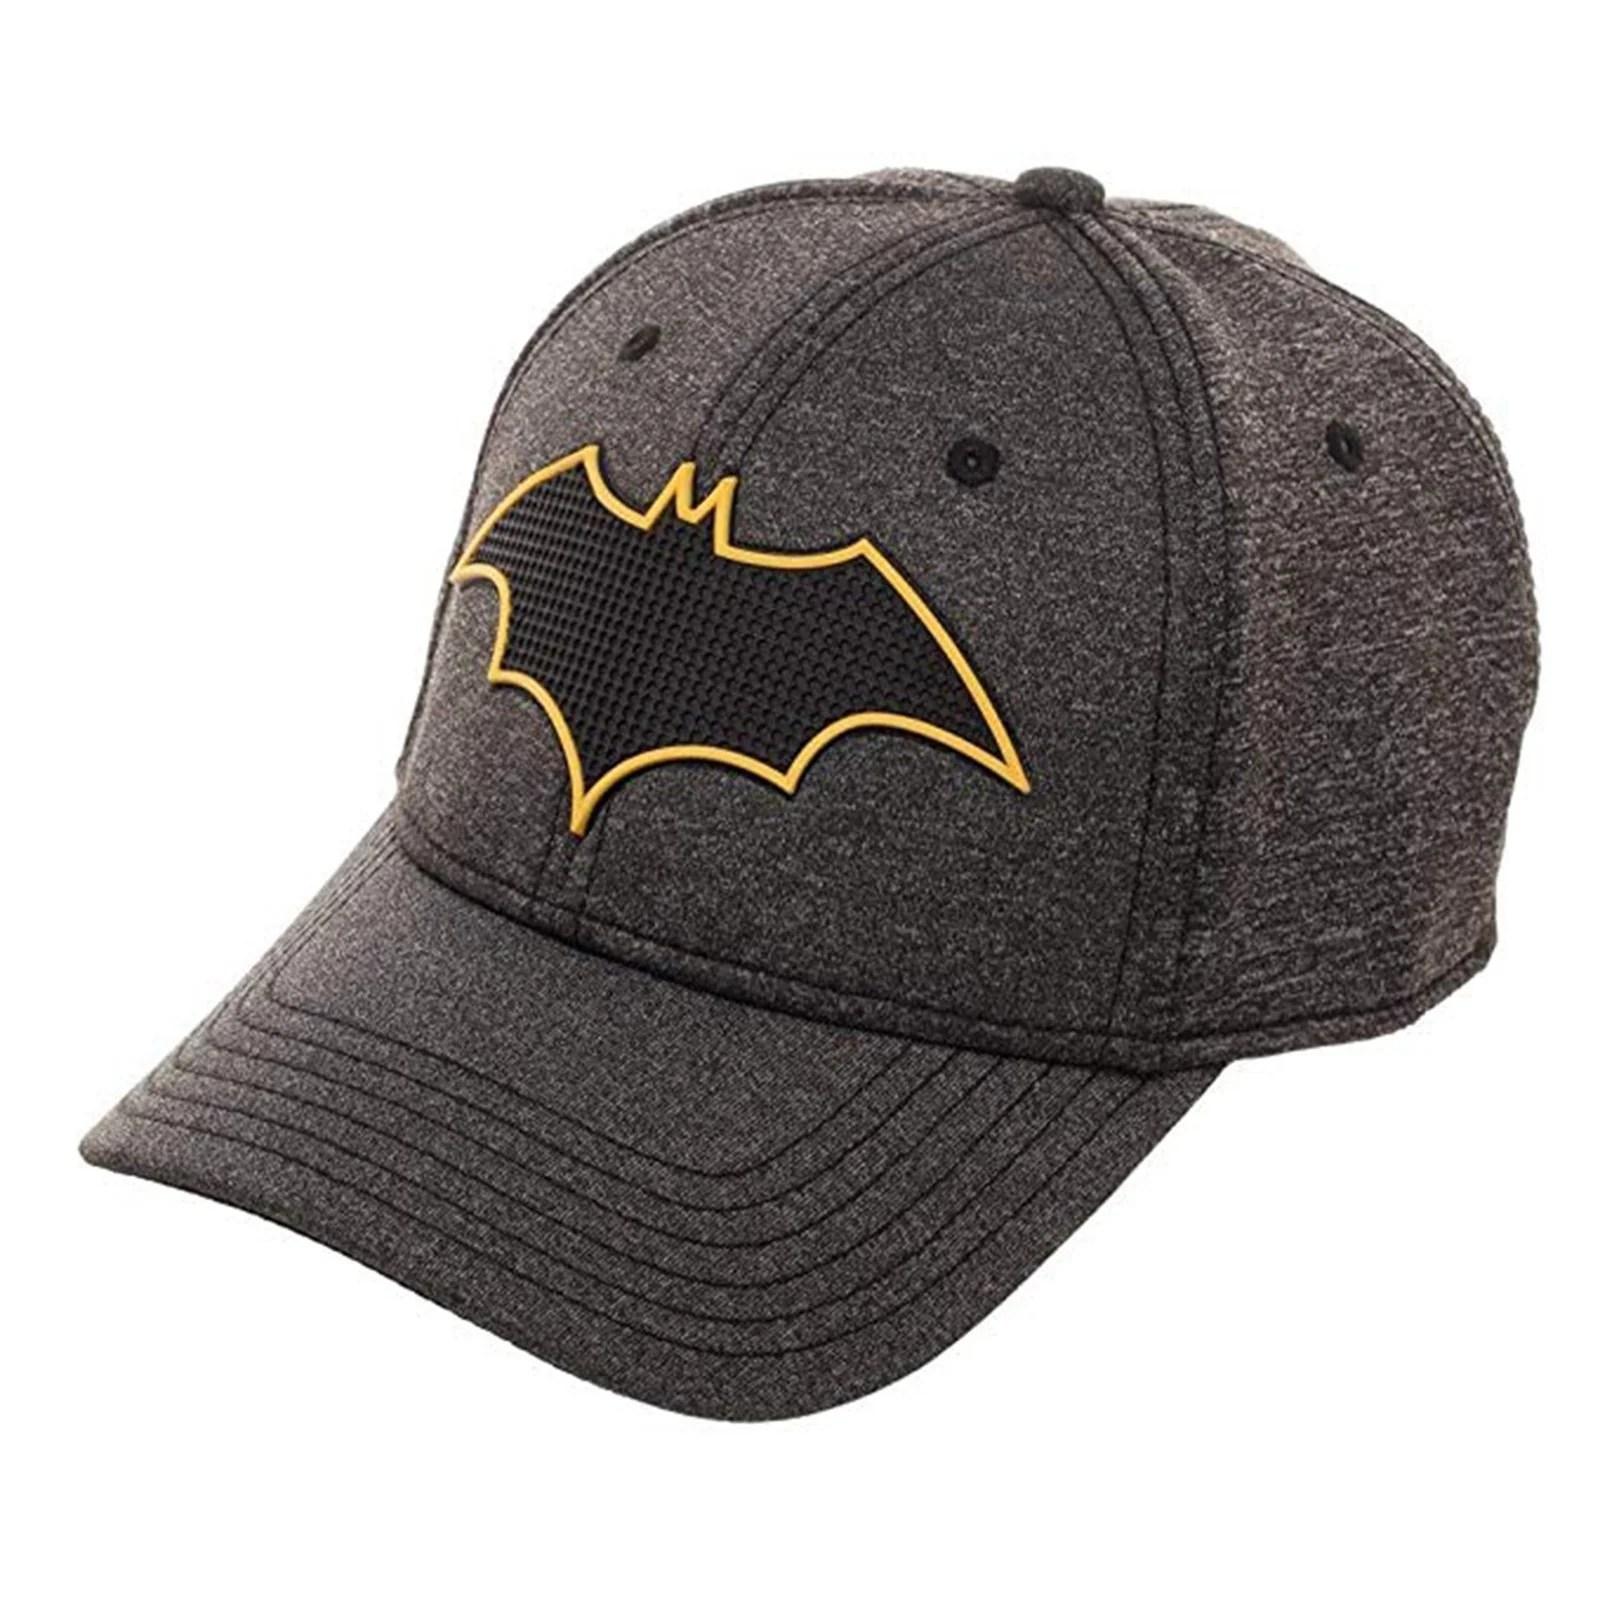 batman new 52 rubber